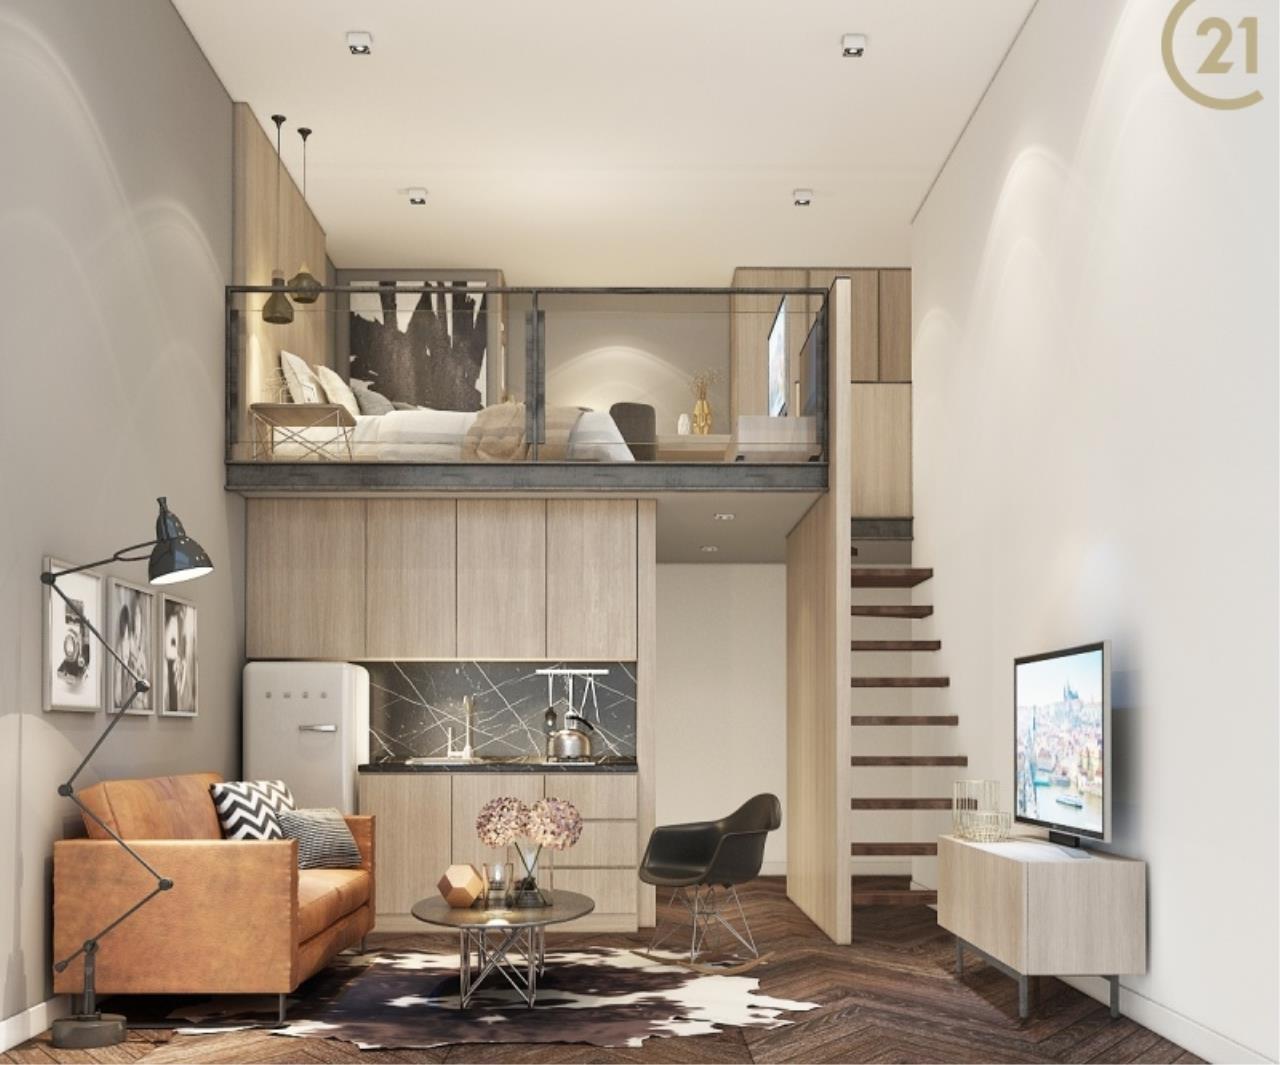 Century21 Skylux Agency's Siamese Sukhumvit / Condo For Sale / 1 Bedroom / 44.39 SQM / BTS On Nut / Bangkok 2